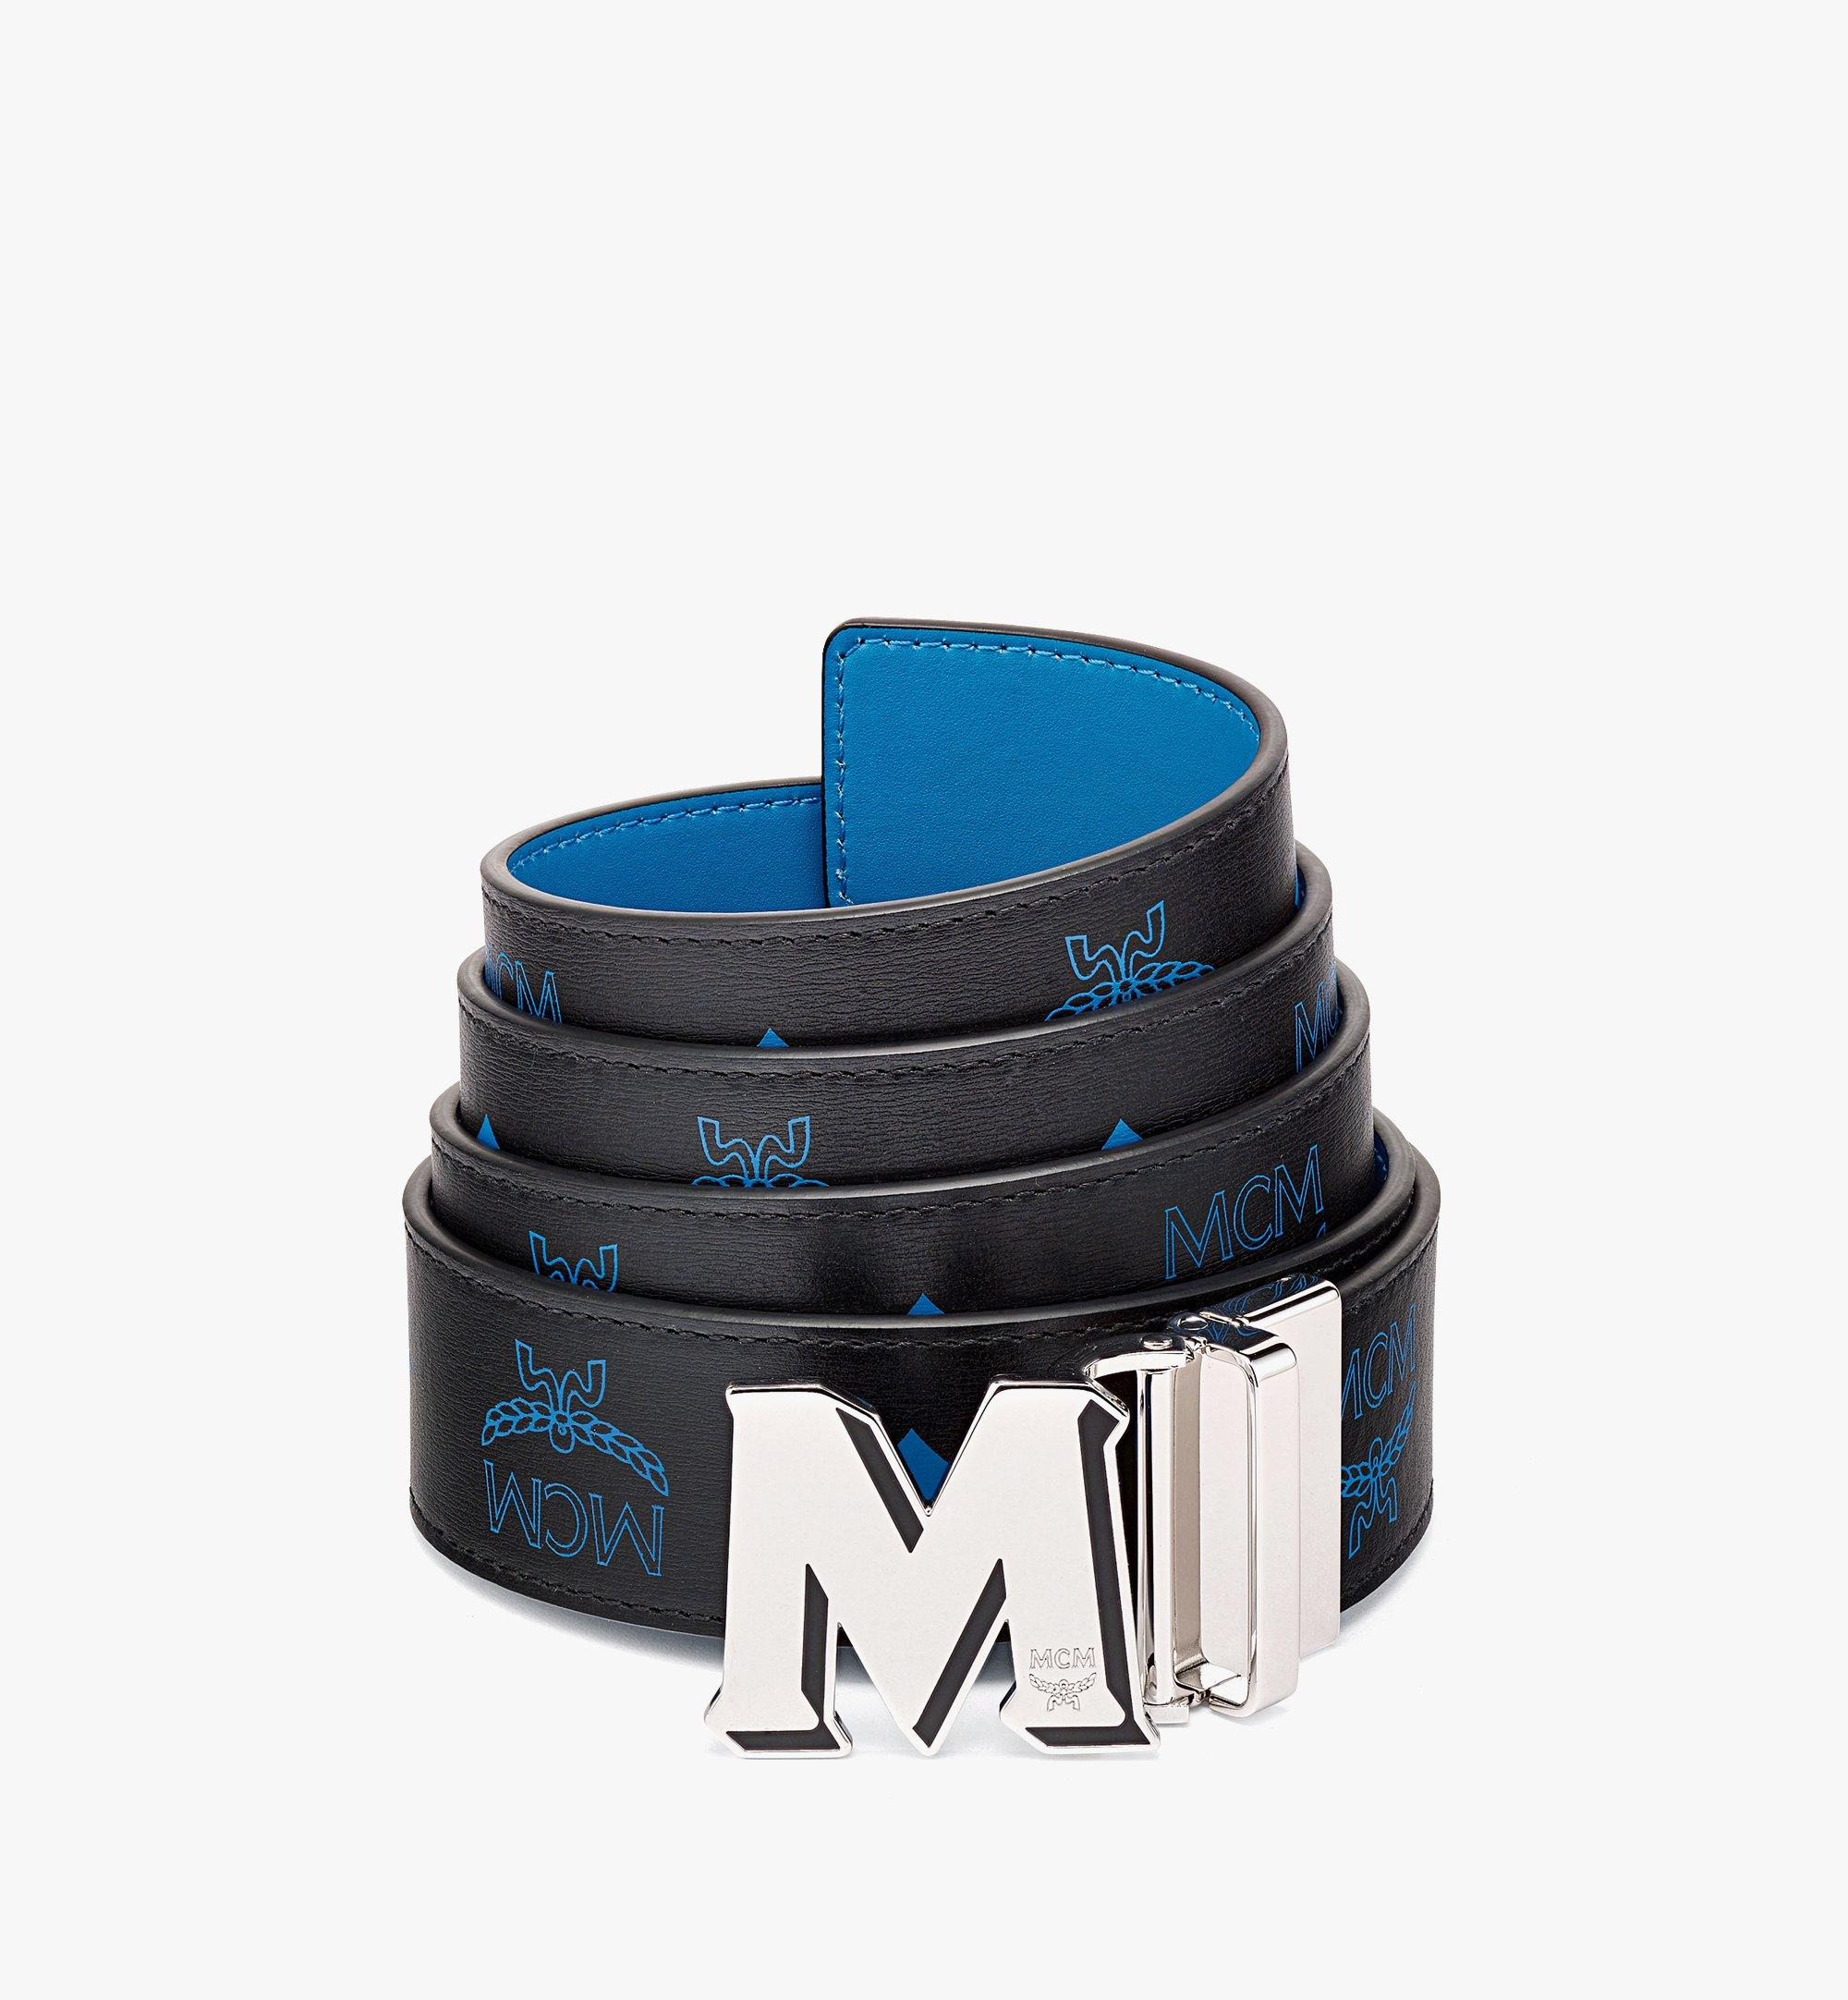 MCM Claus M字压花皮革双面腰带 Blue MXBBAVI09H9001 更多视角 1